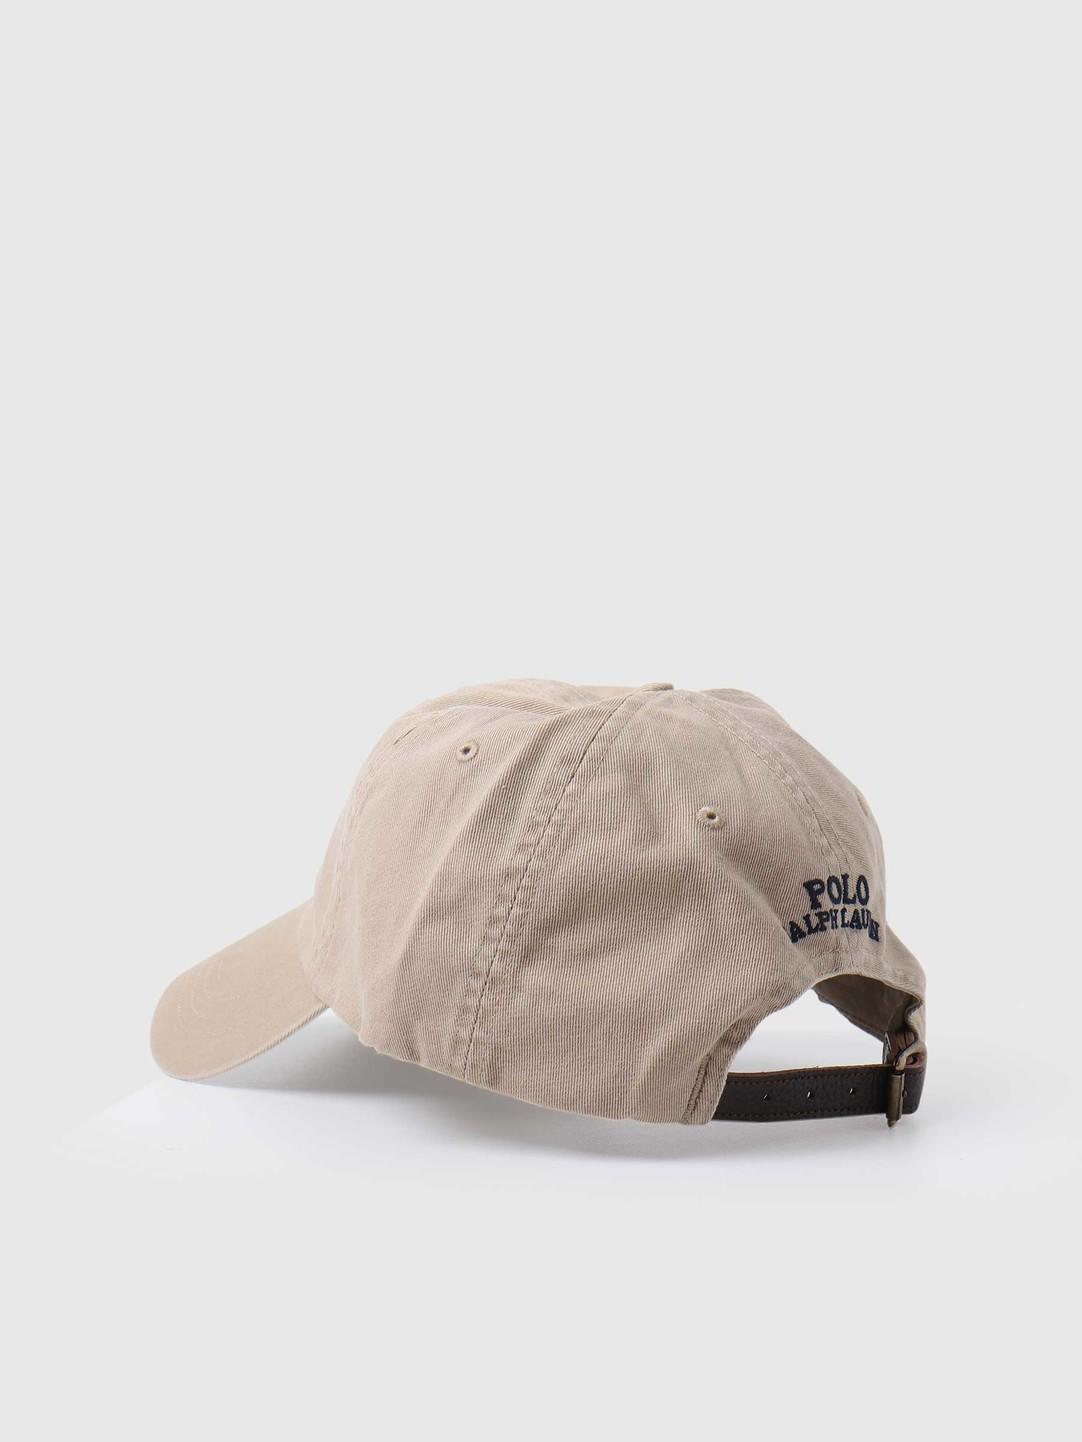 Polo Ralph Lauren Polo Ralph Lauren Classic Sport Cap Hat Classic Khaki 710816779001